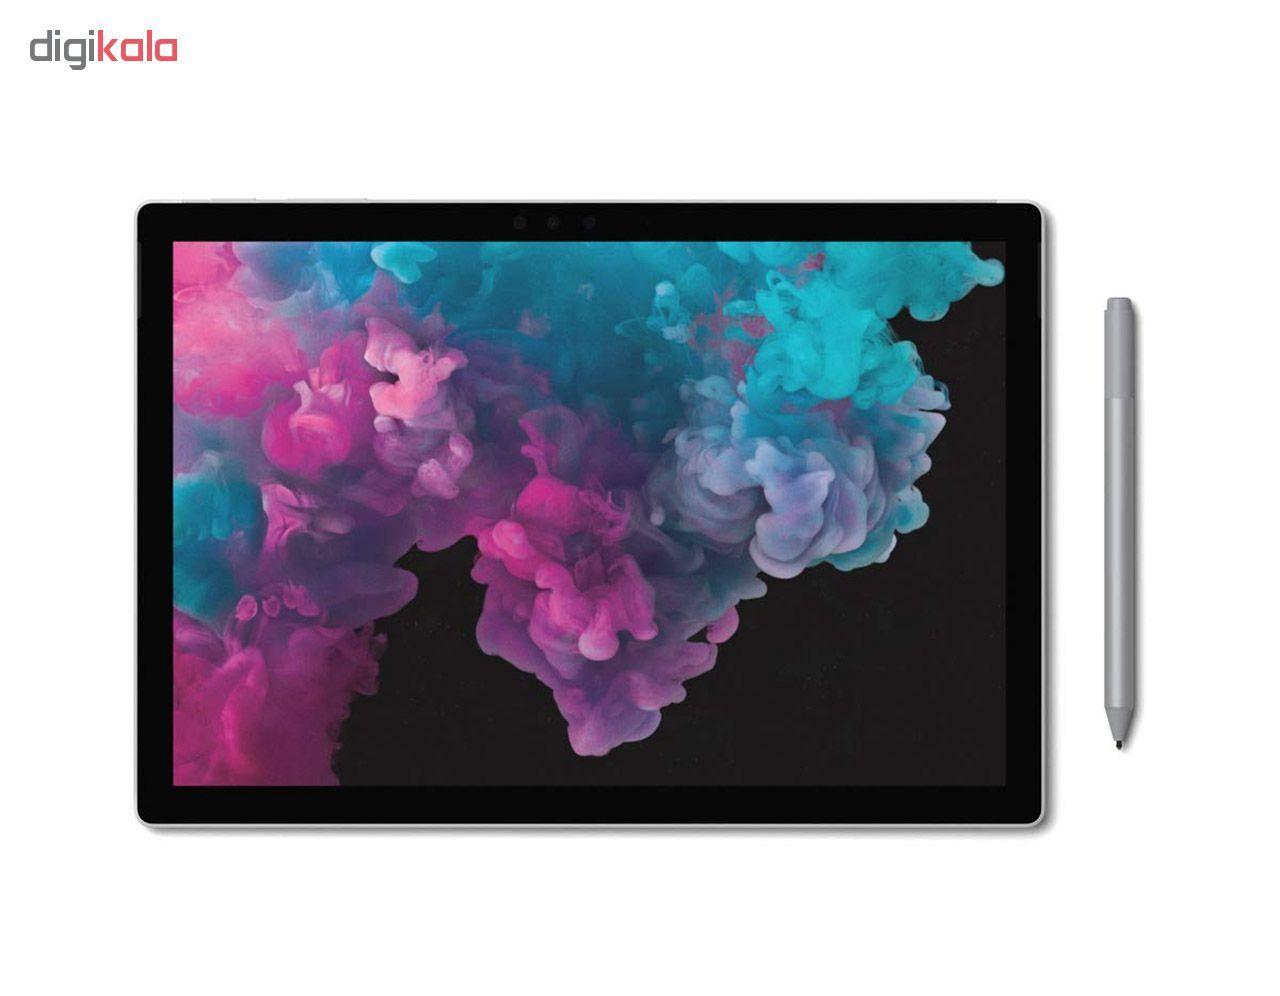 تبلت مایکروسافت مدل Surface Pro 6 - H به همراه کیبورد Signature و قلم main 1 7